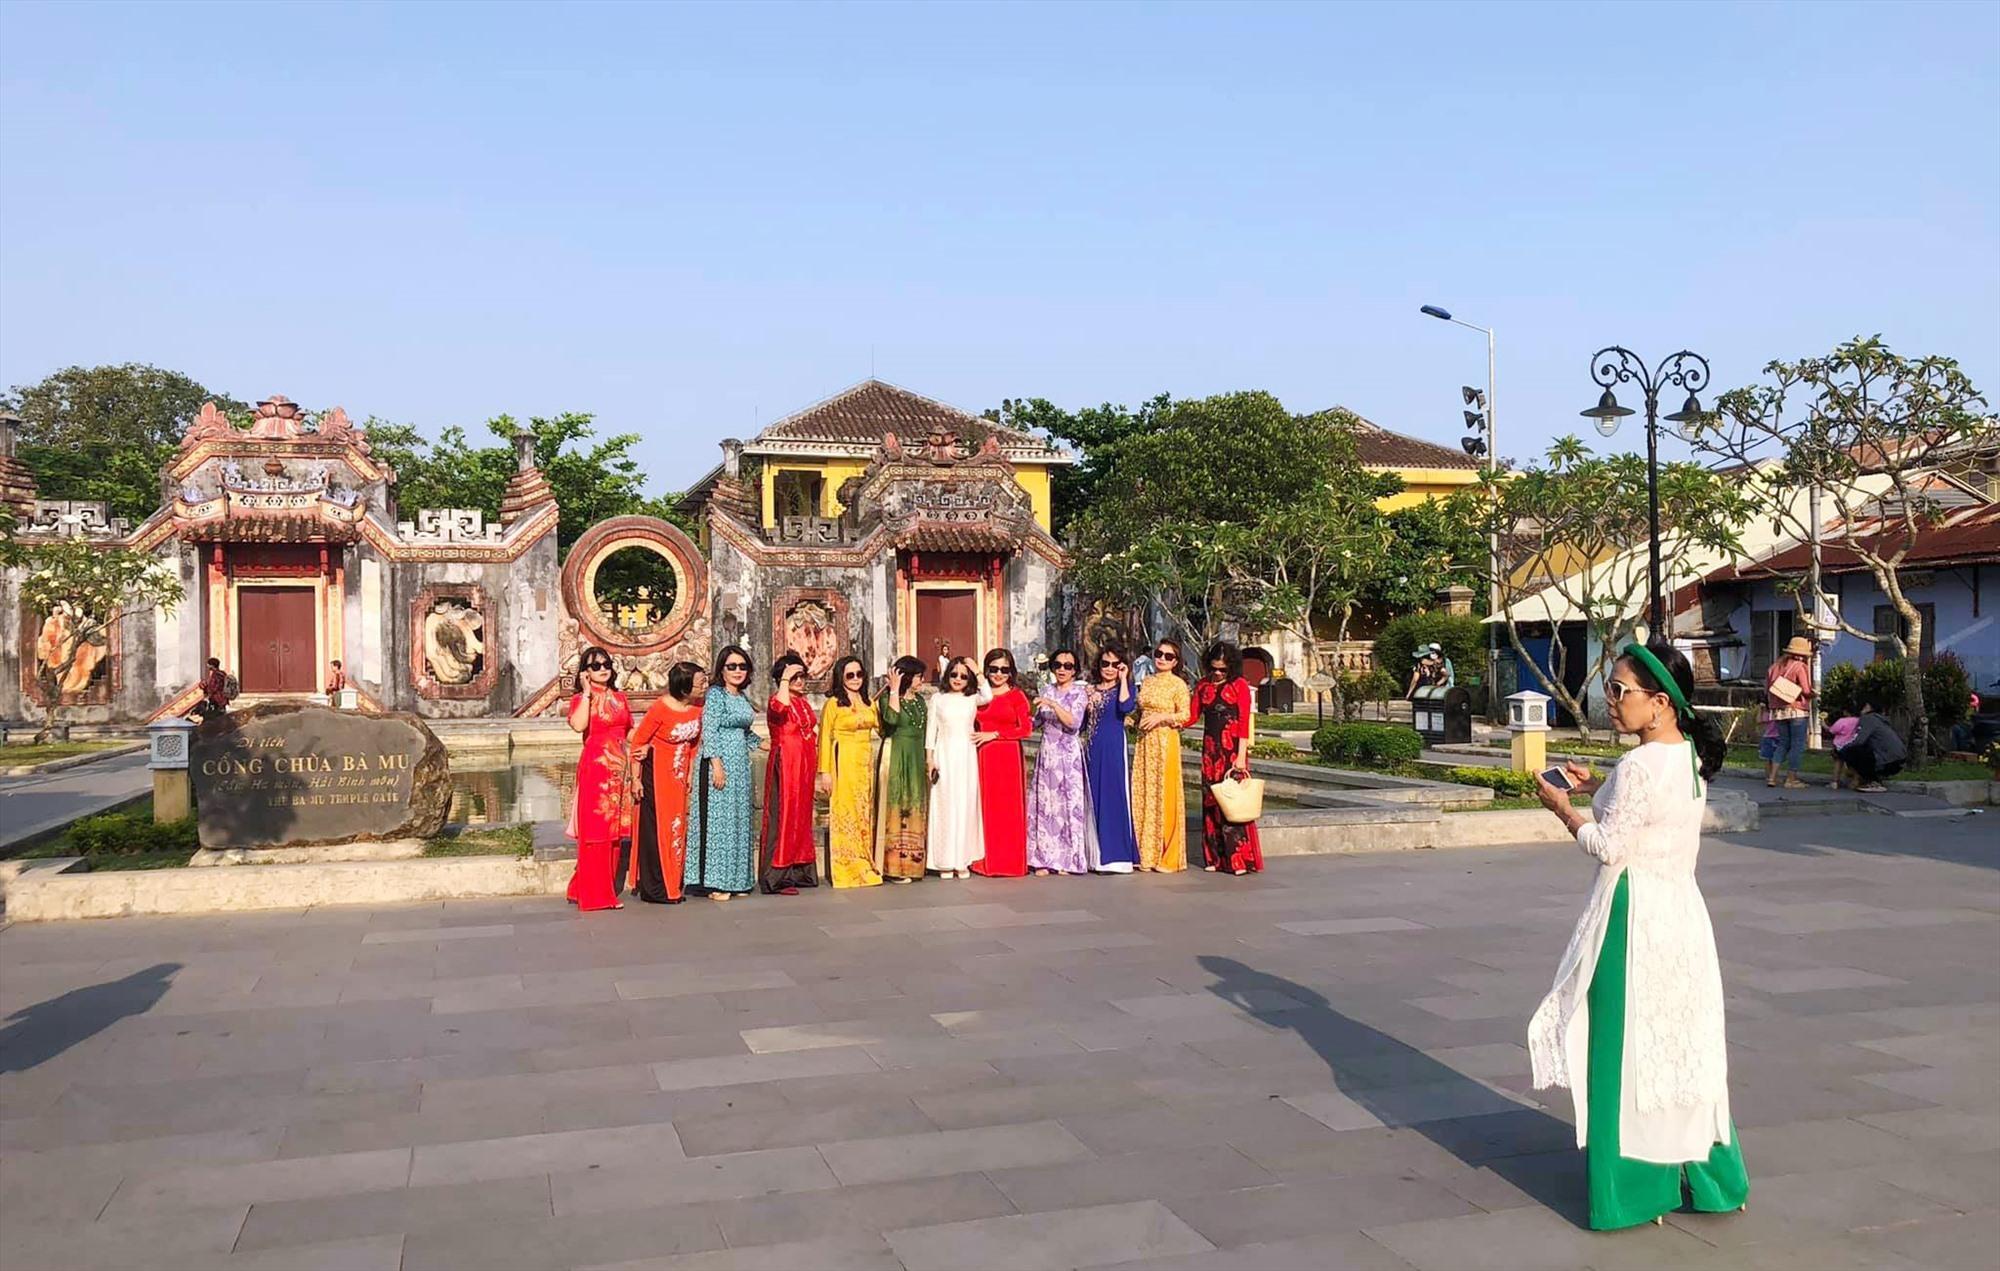 Visitors in front of Ba Mu pagoda